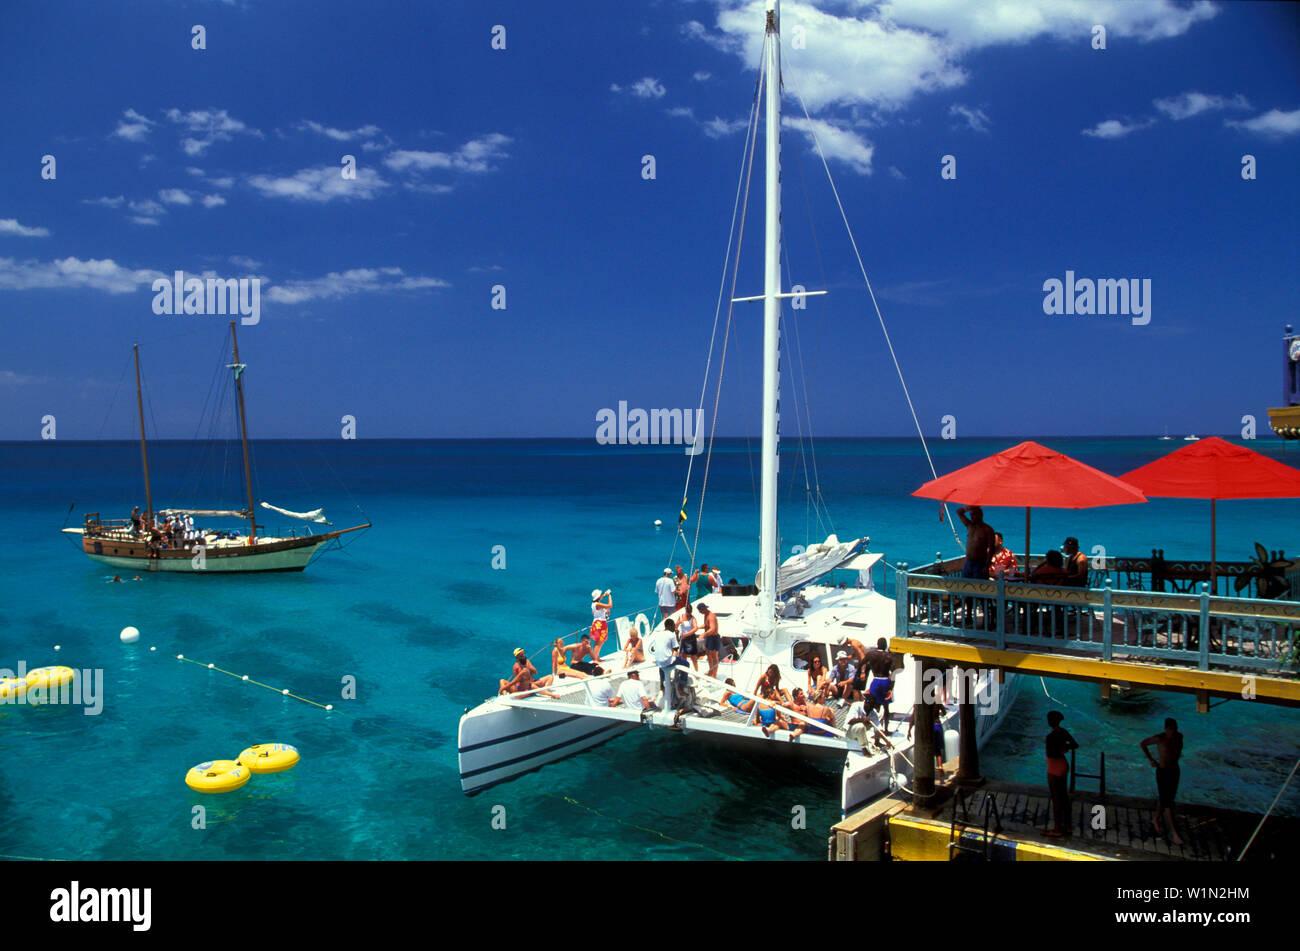 Party im Margueritaville, Montego Bay, Jamaica Karibik Stock